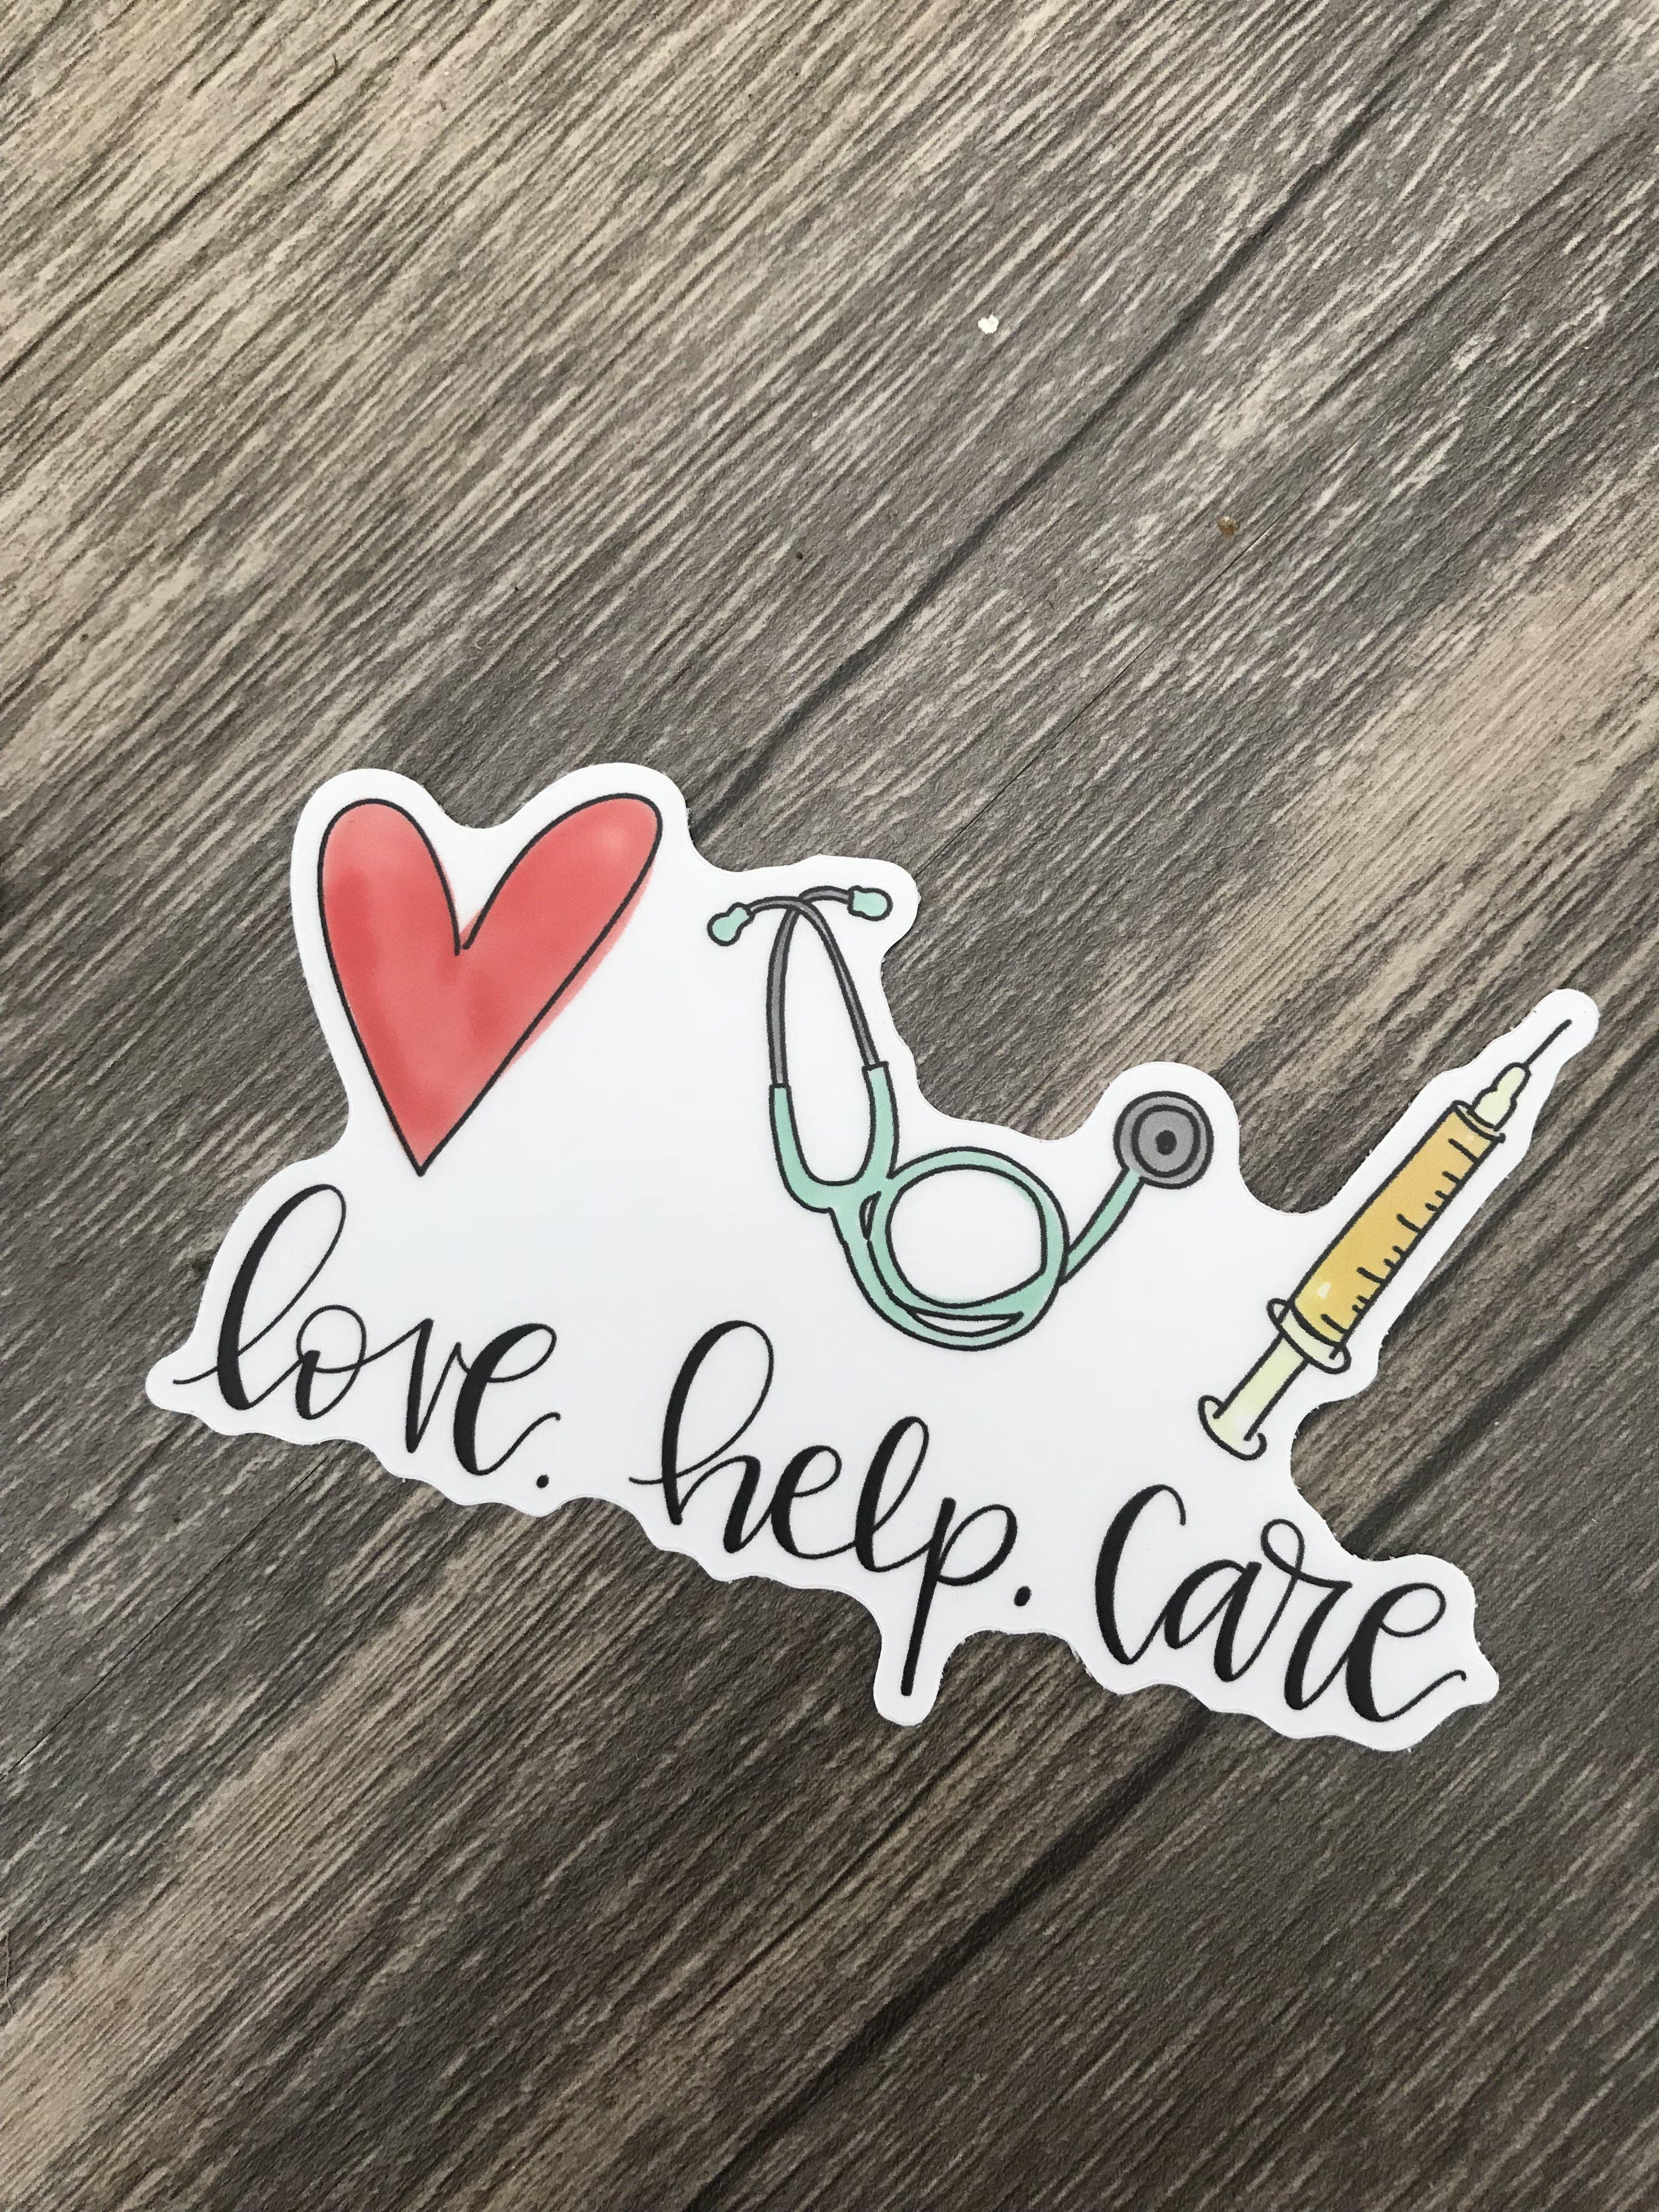 Photo of Love. Help. Care. Sticker